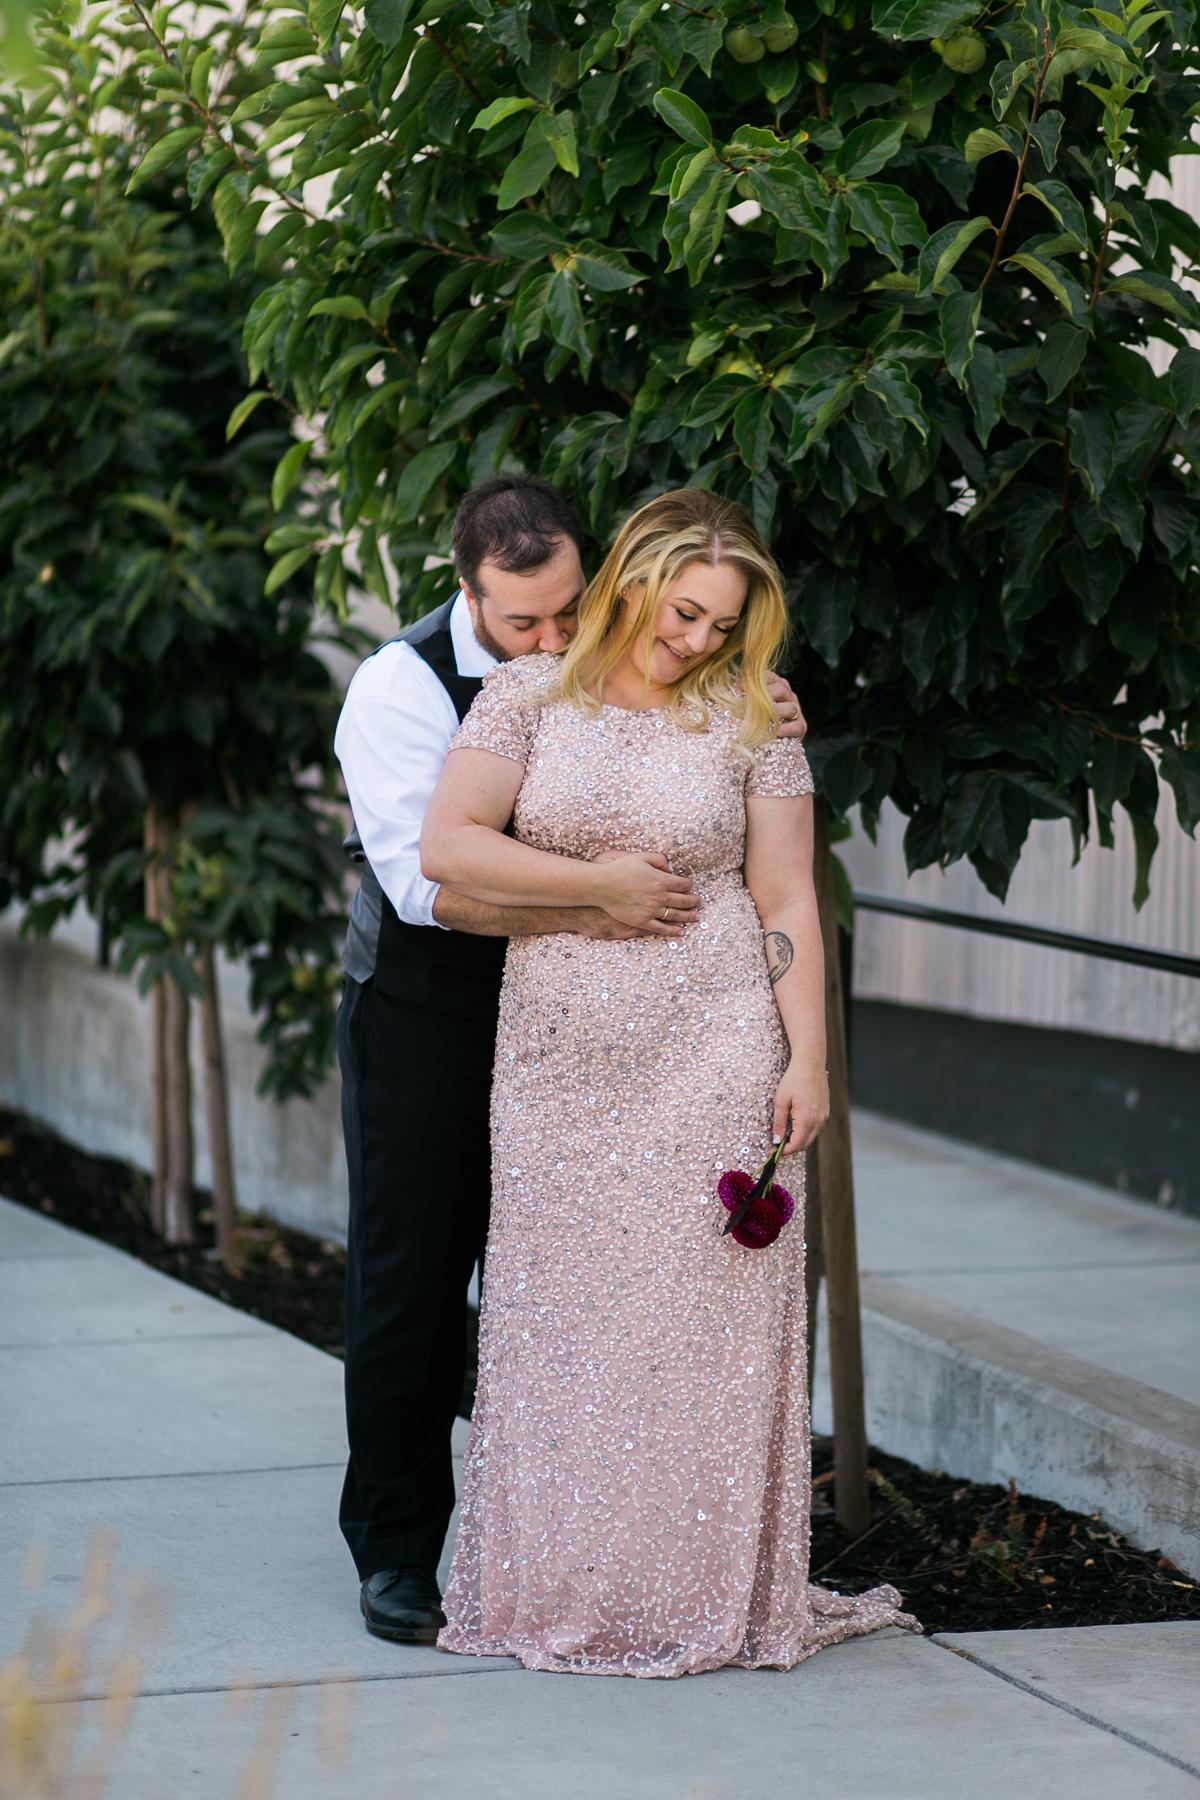 Sebastopol Barlow Wedding Photography Maria Villano-10.jpg